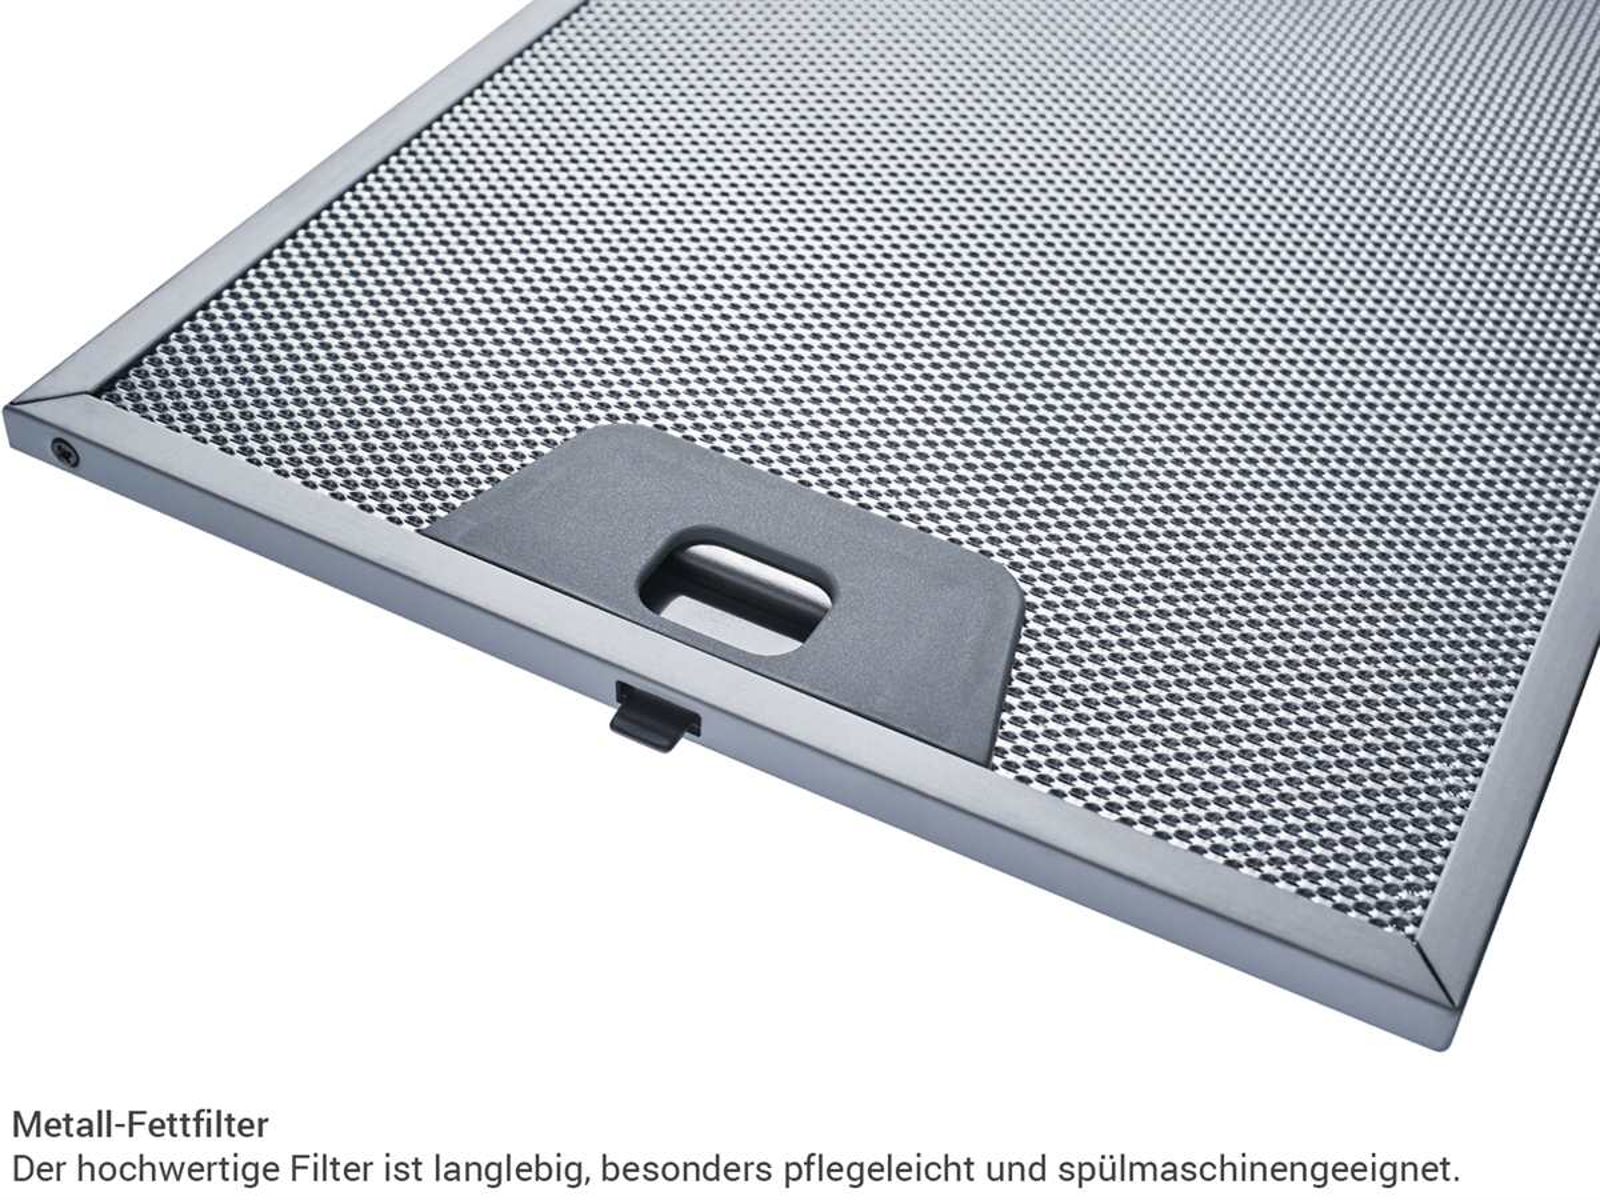 Dunstabzugshaube filter metall reinigen dunstabzugshaube reinigen